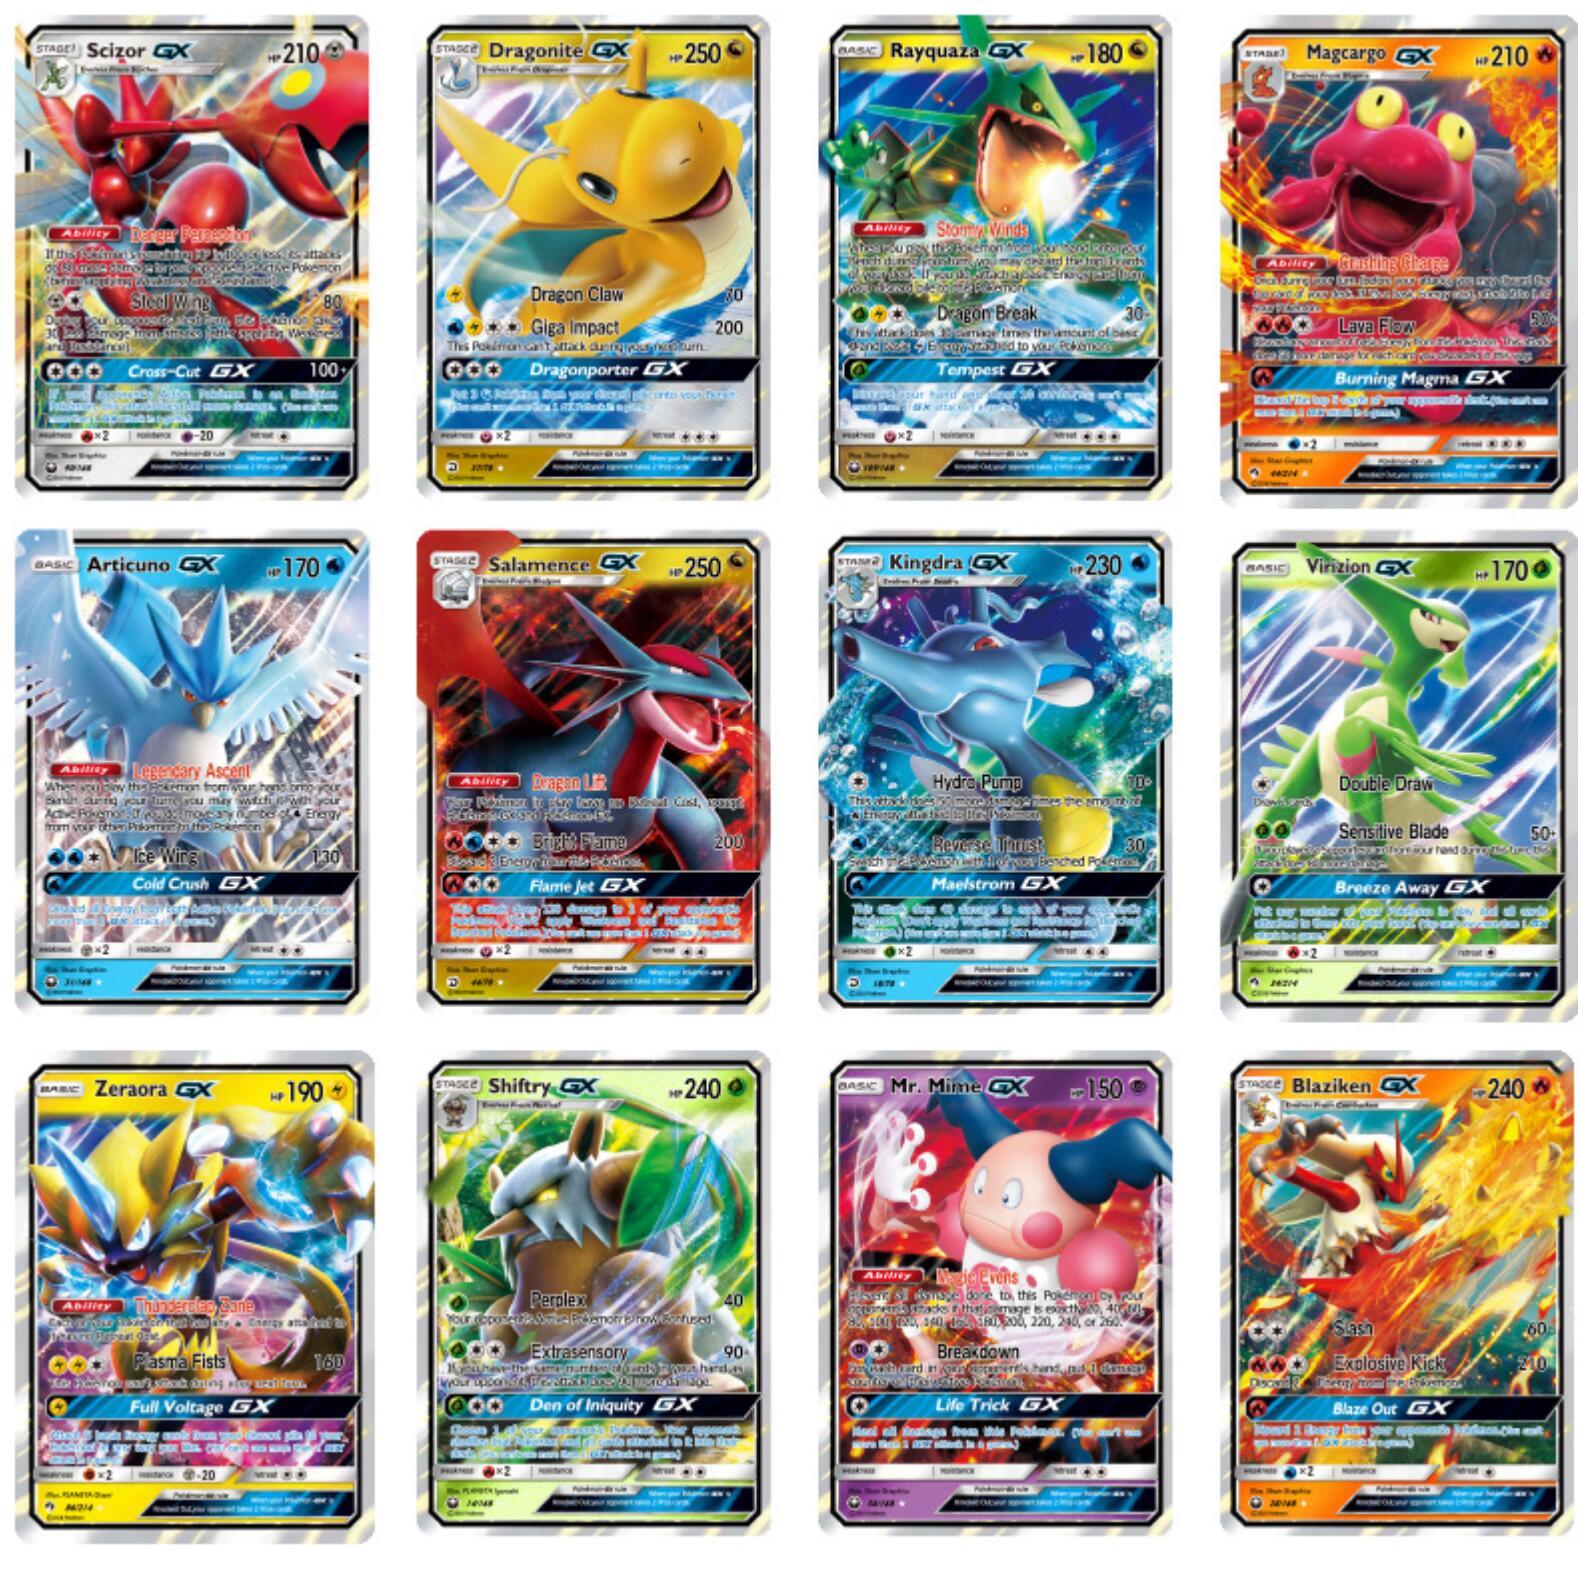 200 Pcs 25 50pcs GX MEGA Shining TAKARA TOMY Cards Game Battle Carte 100pcs Trading Cards Game Child